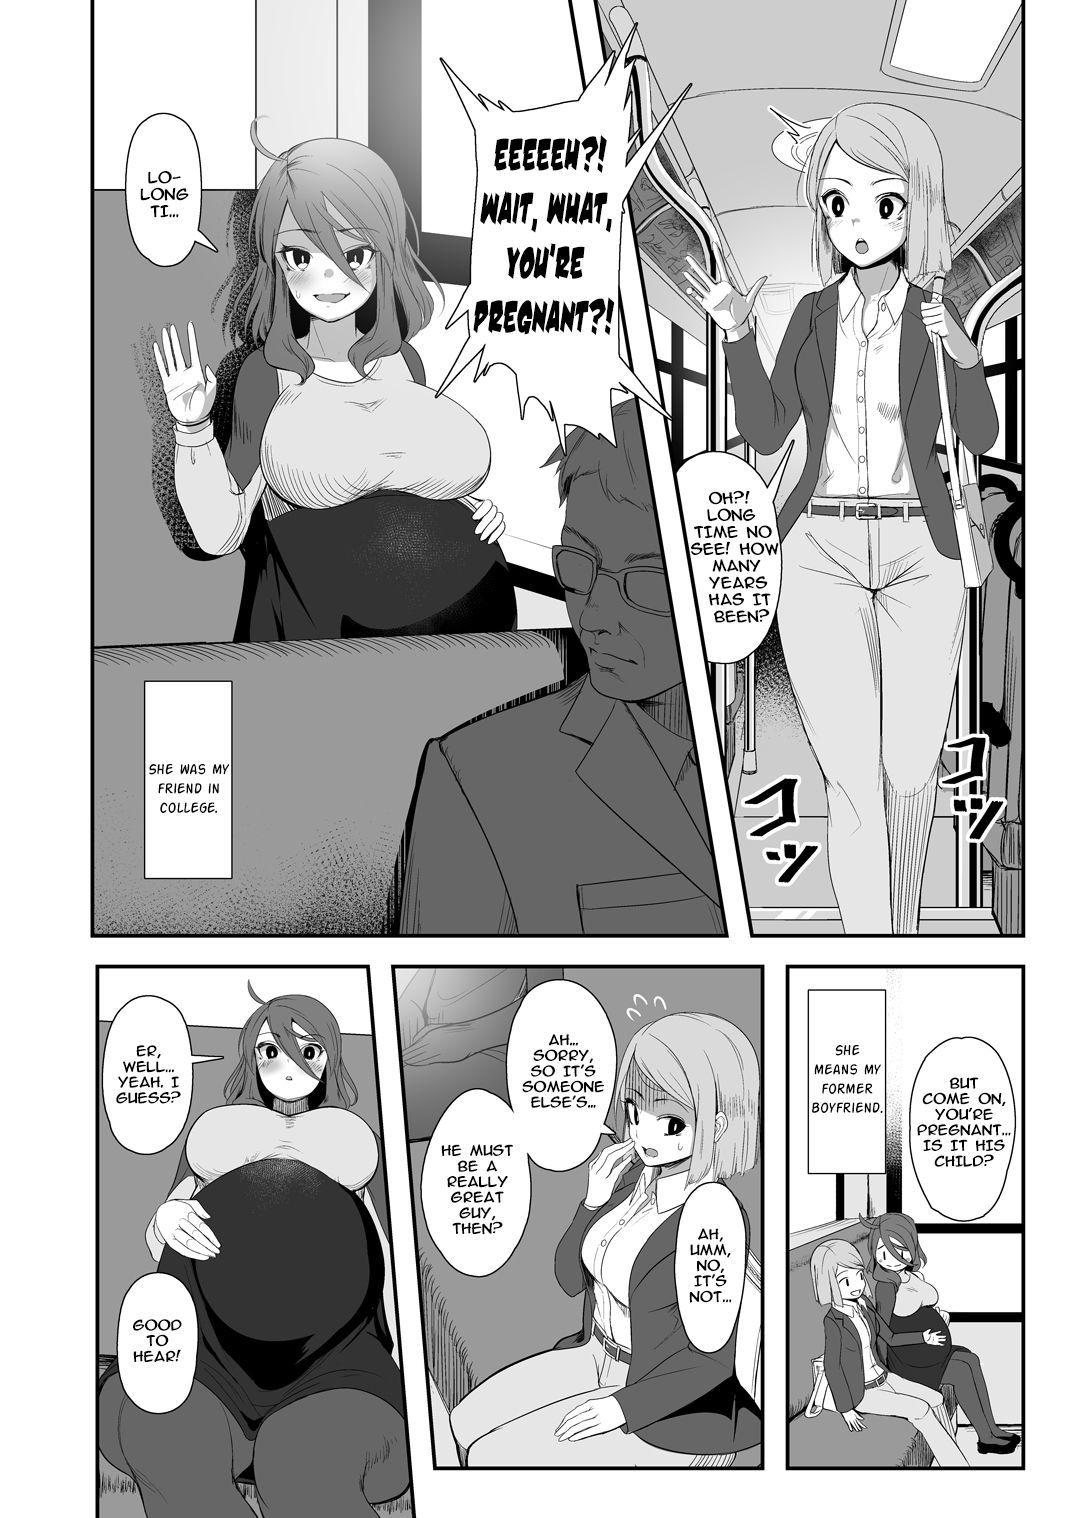 Igyo no Kimi to | A Tentacled Romance Ch. 1-2 page 22